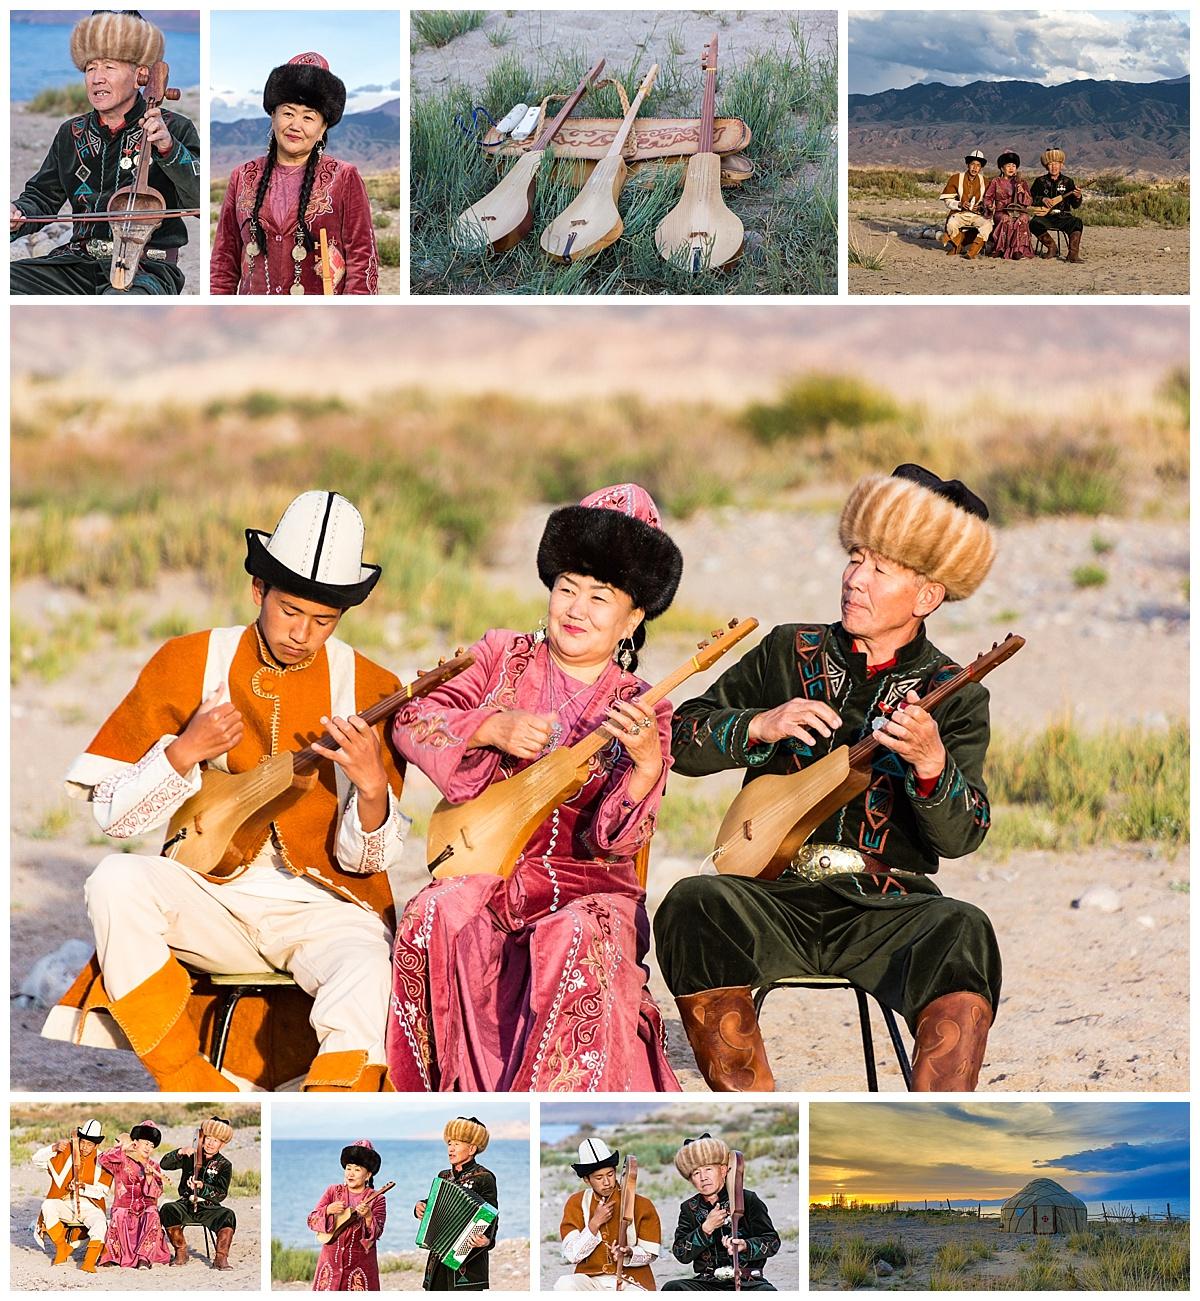 Issyk Kul, Kyrgyzstan - music